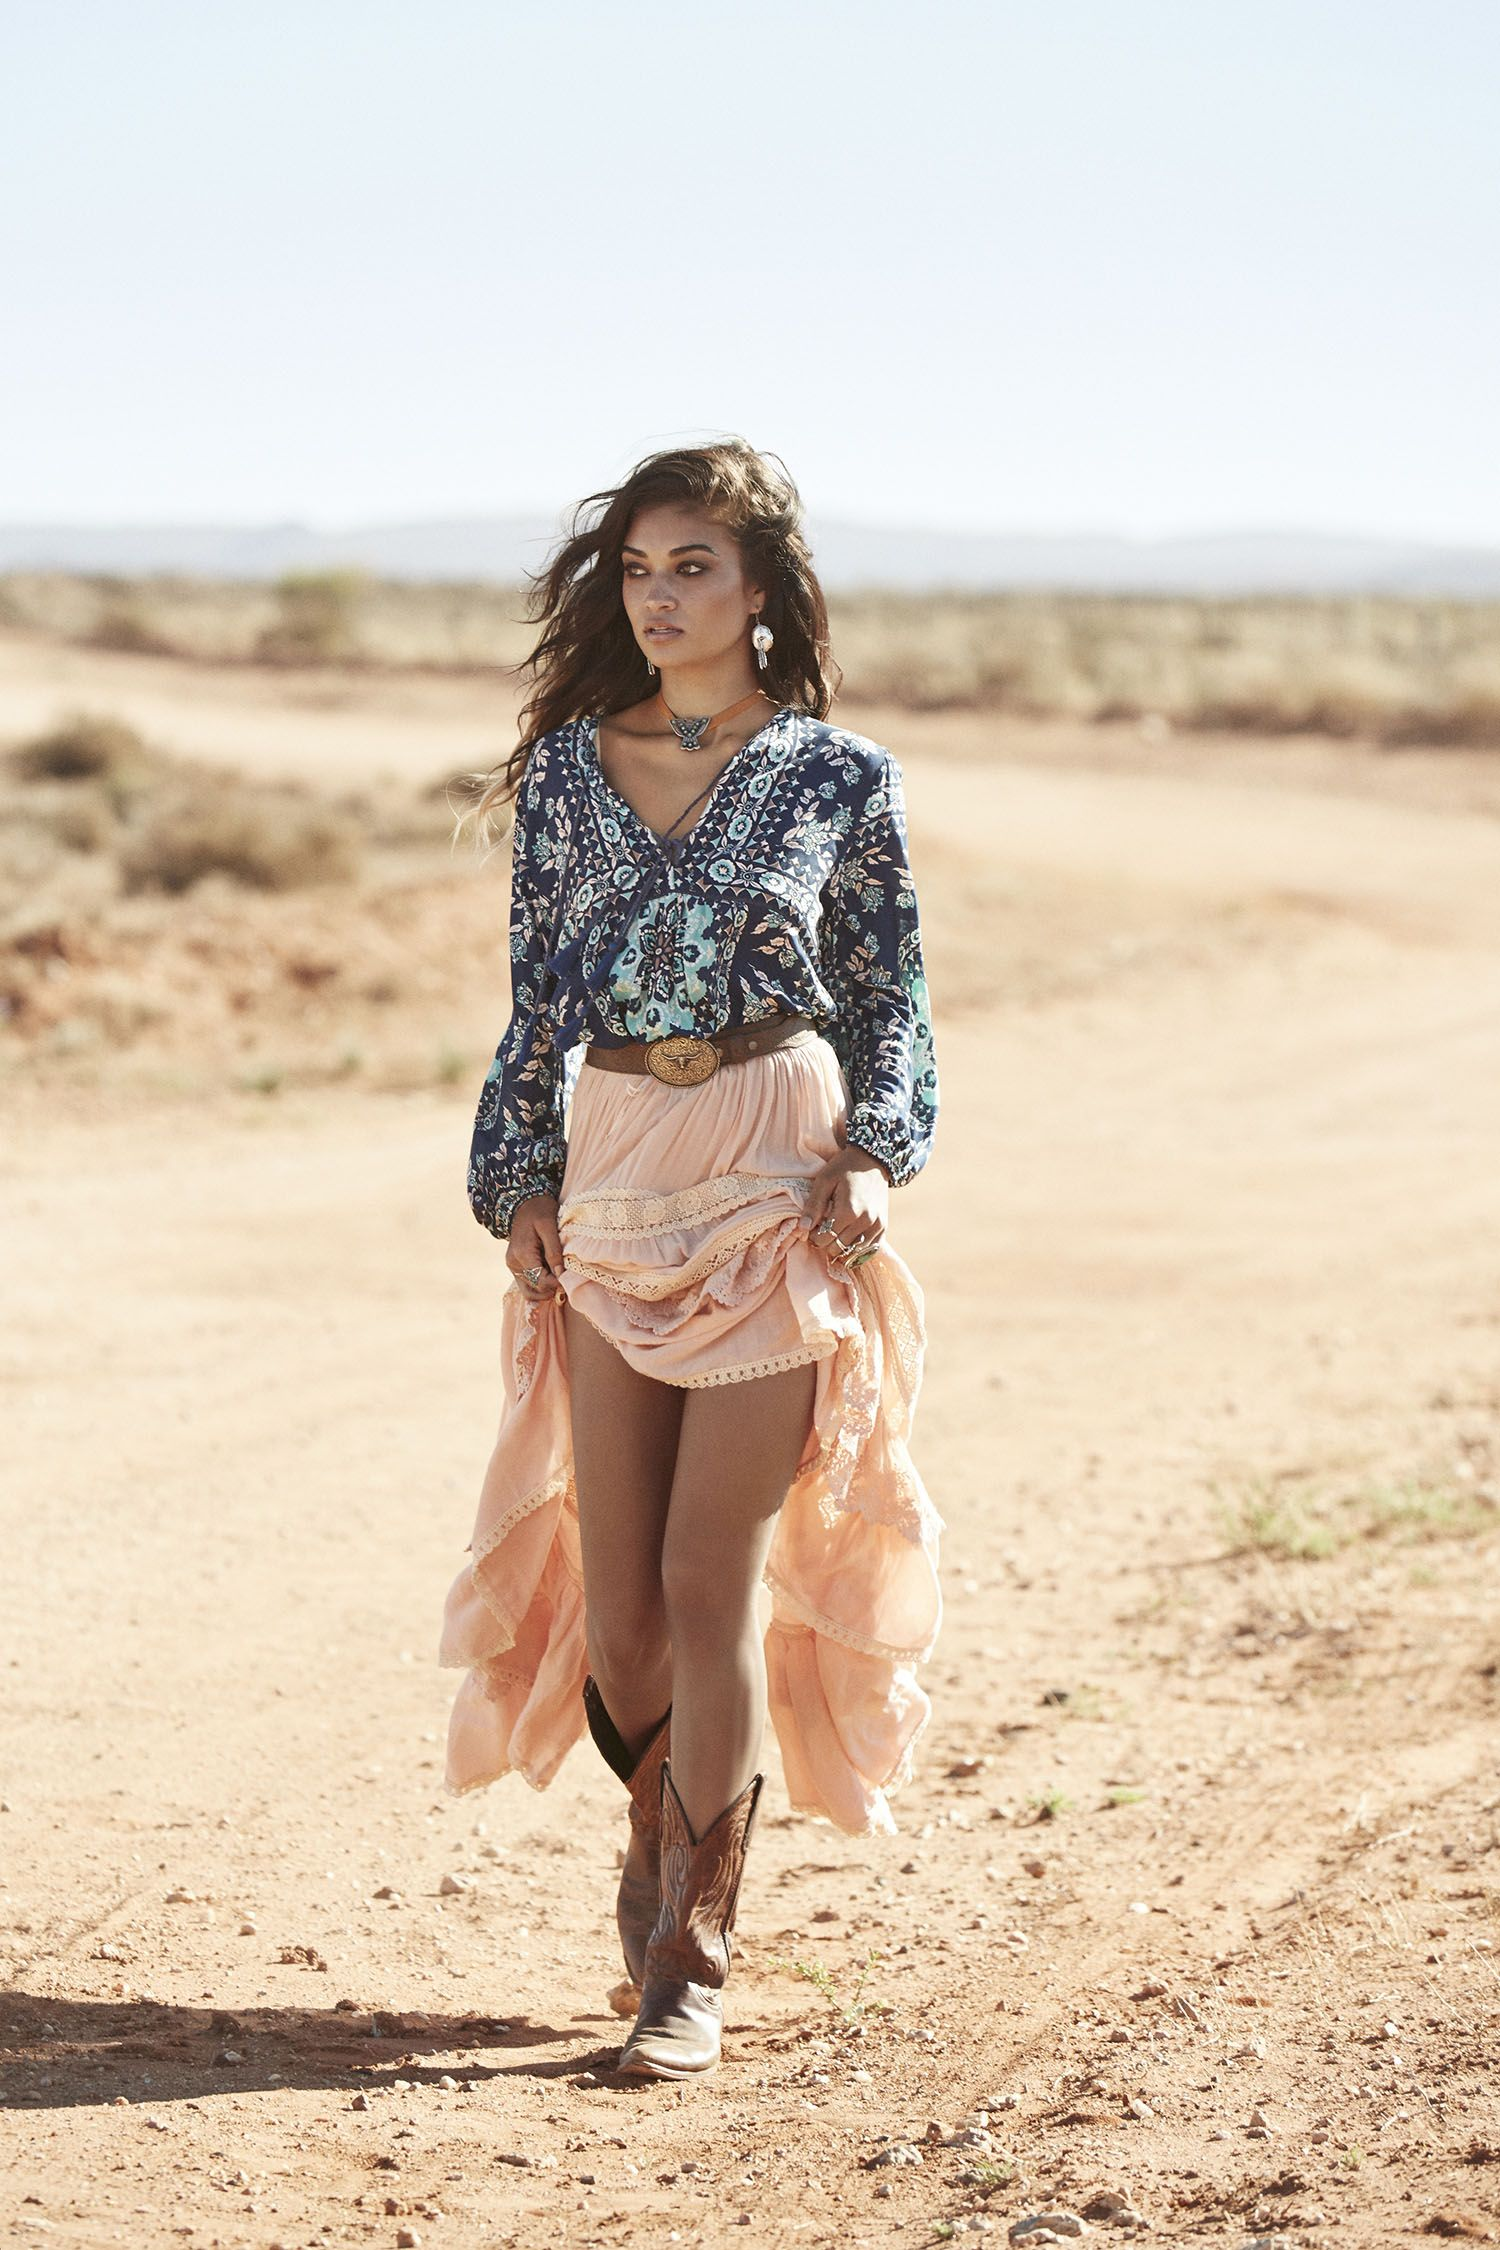 ╰☆╮Boho chic bohemian boho style hippy hippie chic bohème vibe gypsy  fashion indie folk the 70s . ╰☆╮ 9a4f91f221